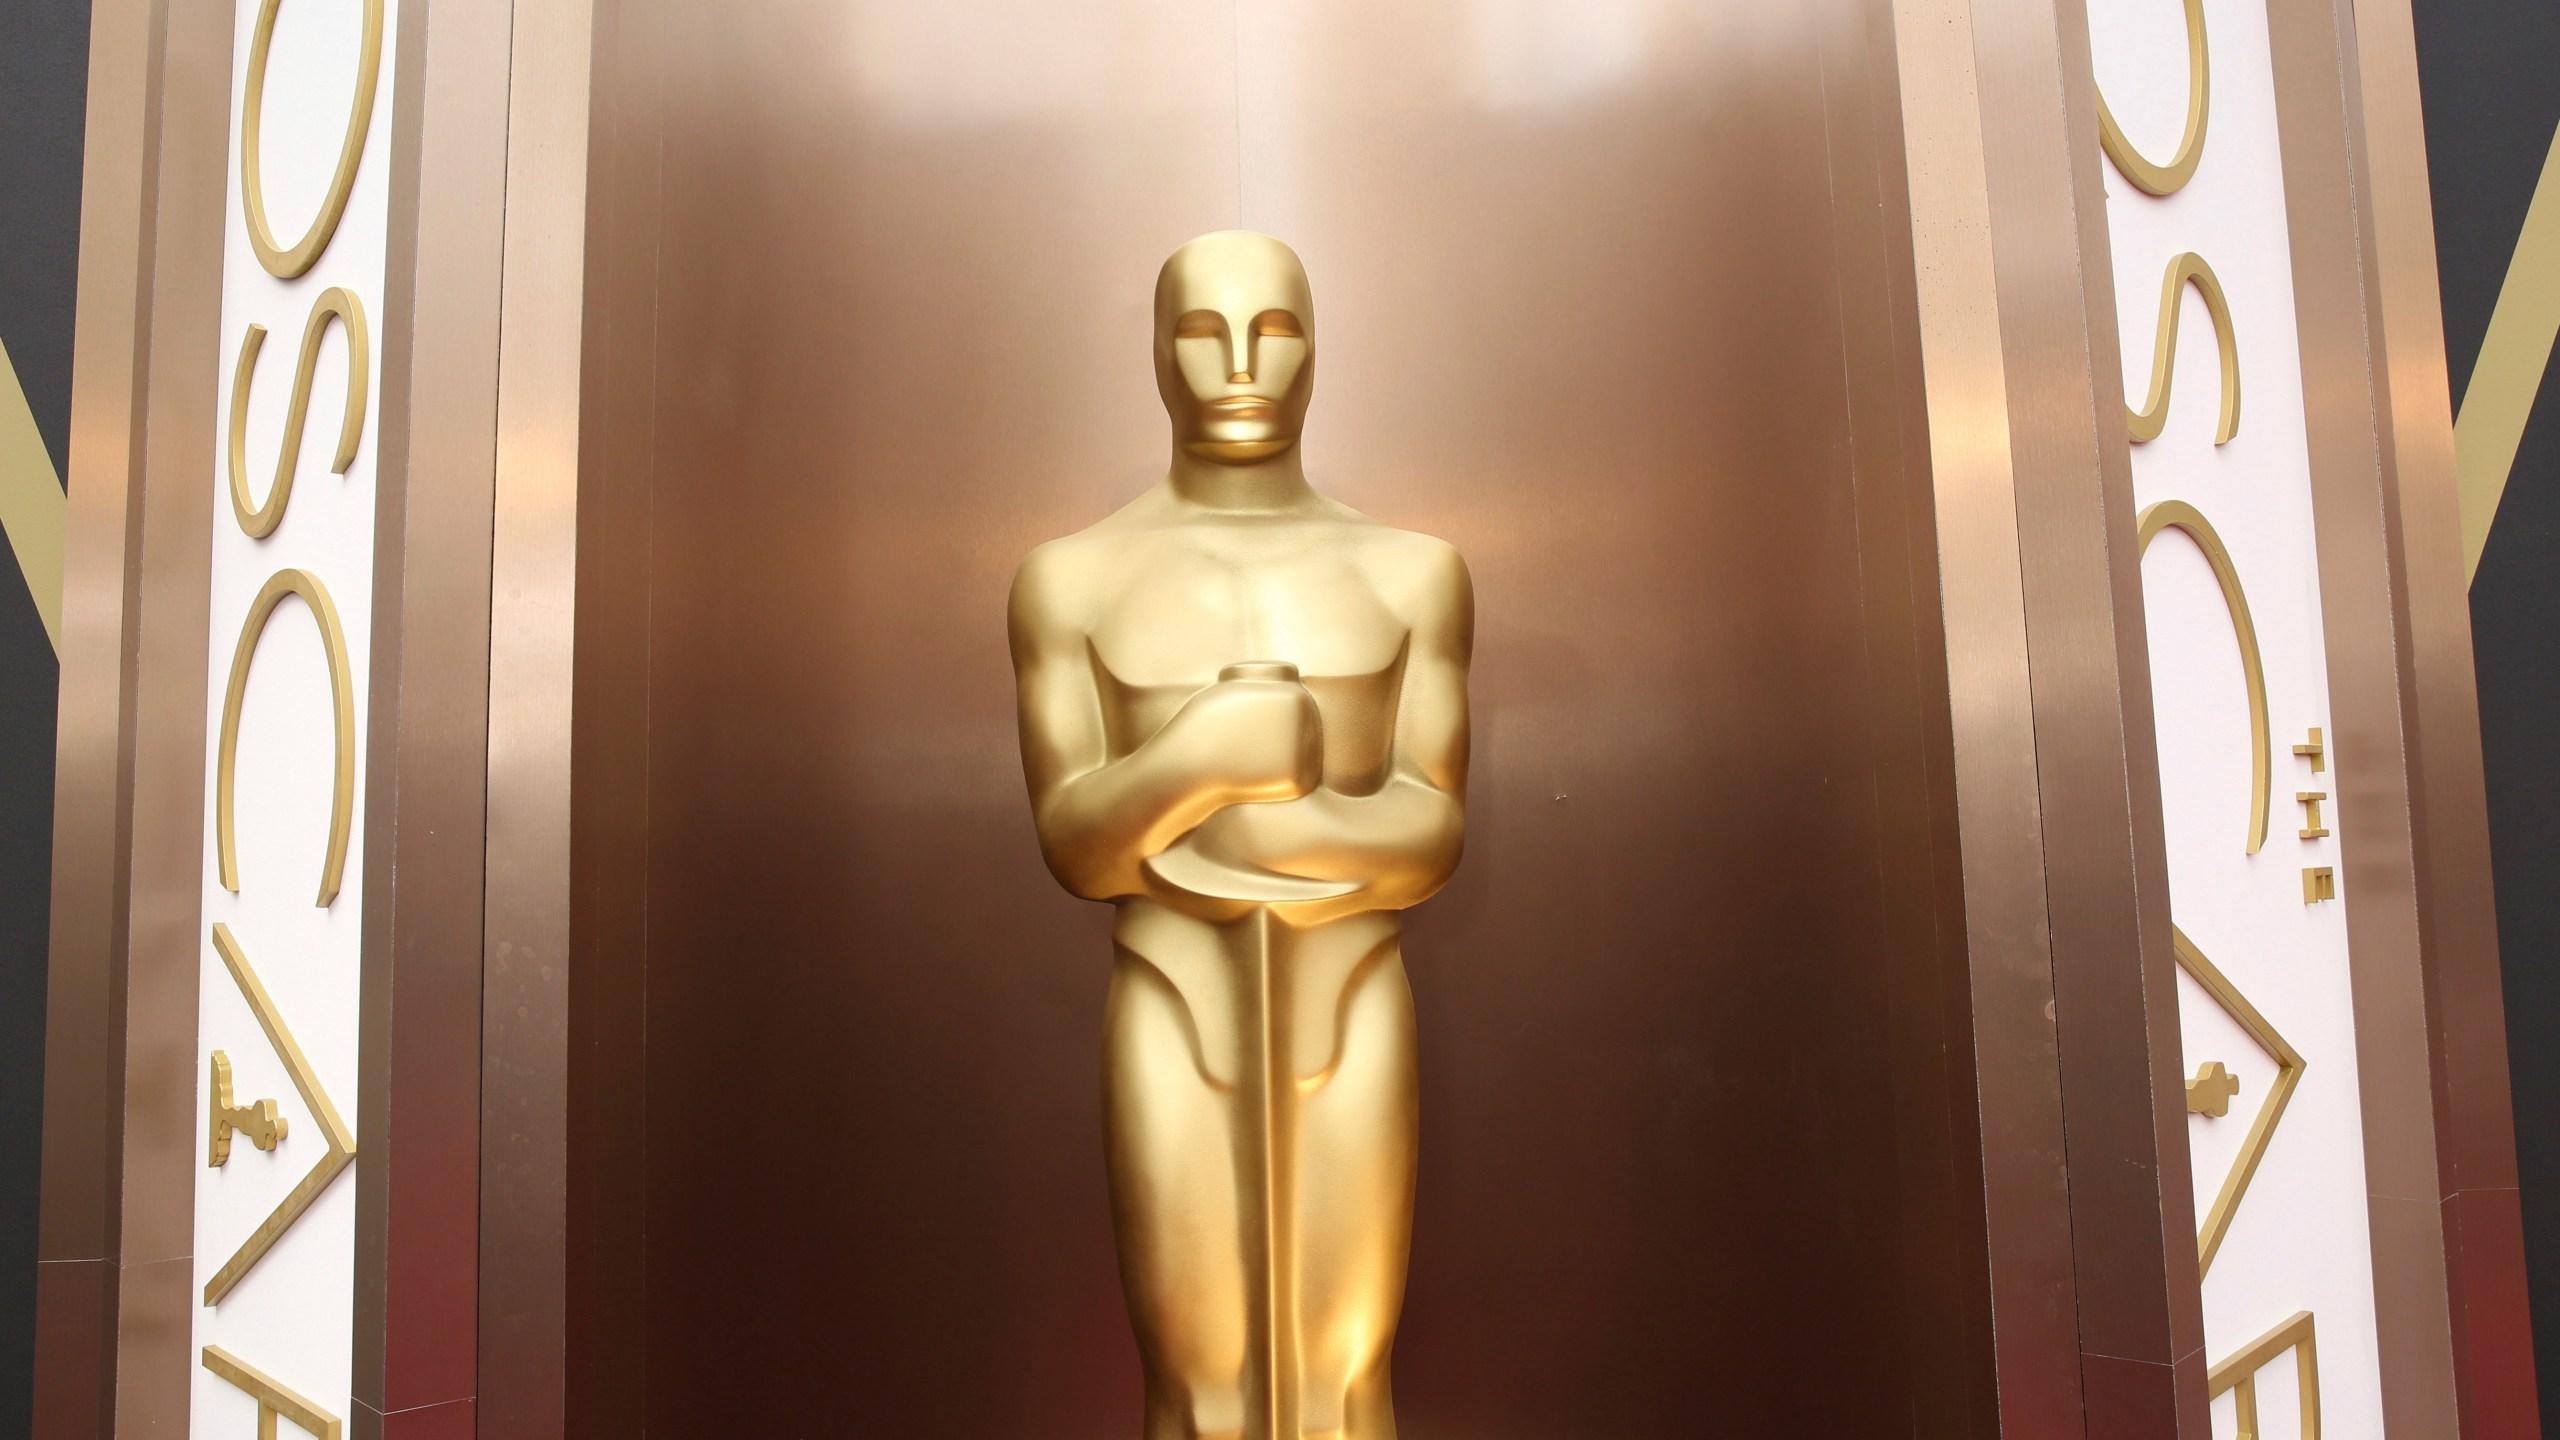 Oscars_Governors_Awards_42691-159532.jpg99767573